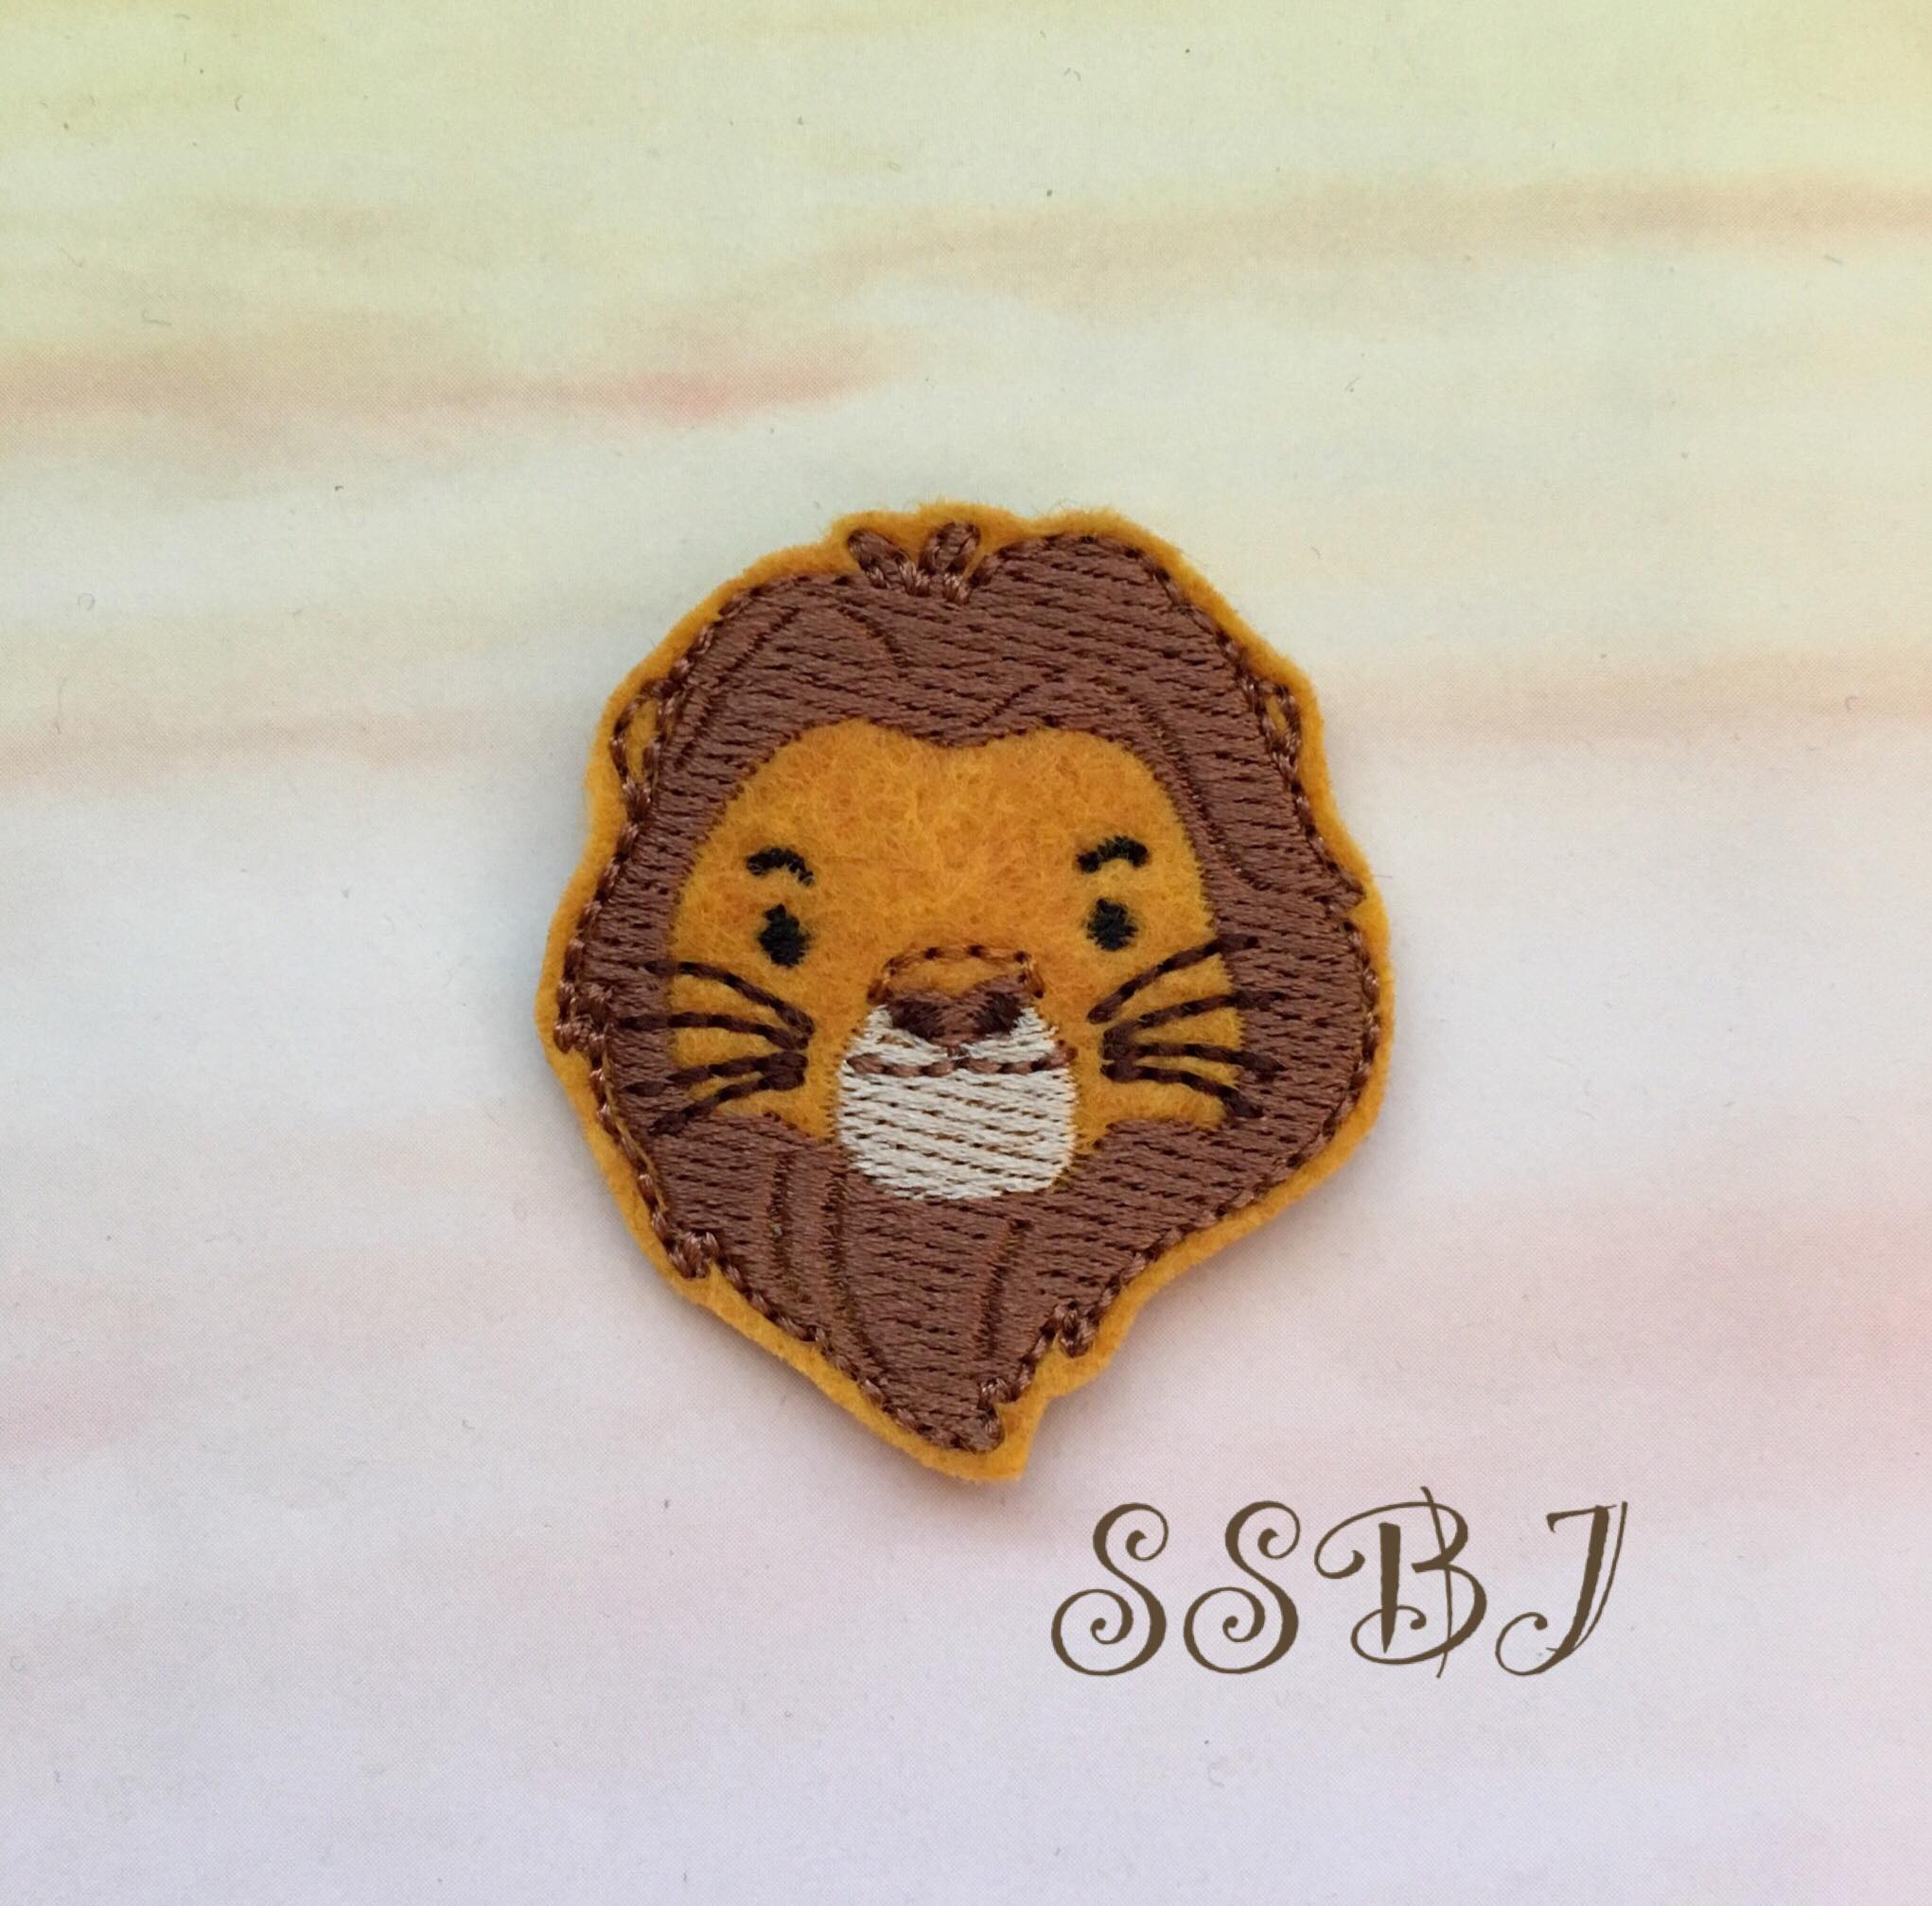 SSBJ Lion Friends Mufasa Embroidery File